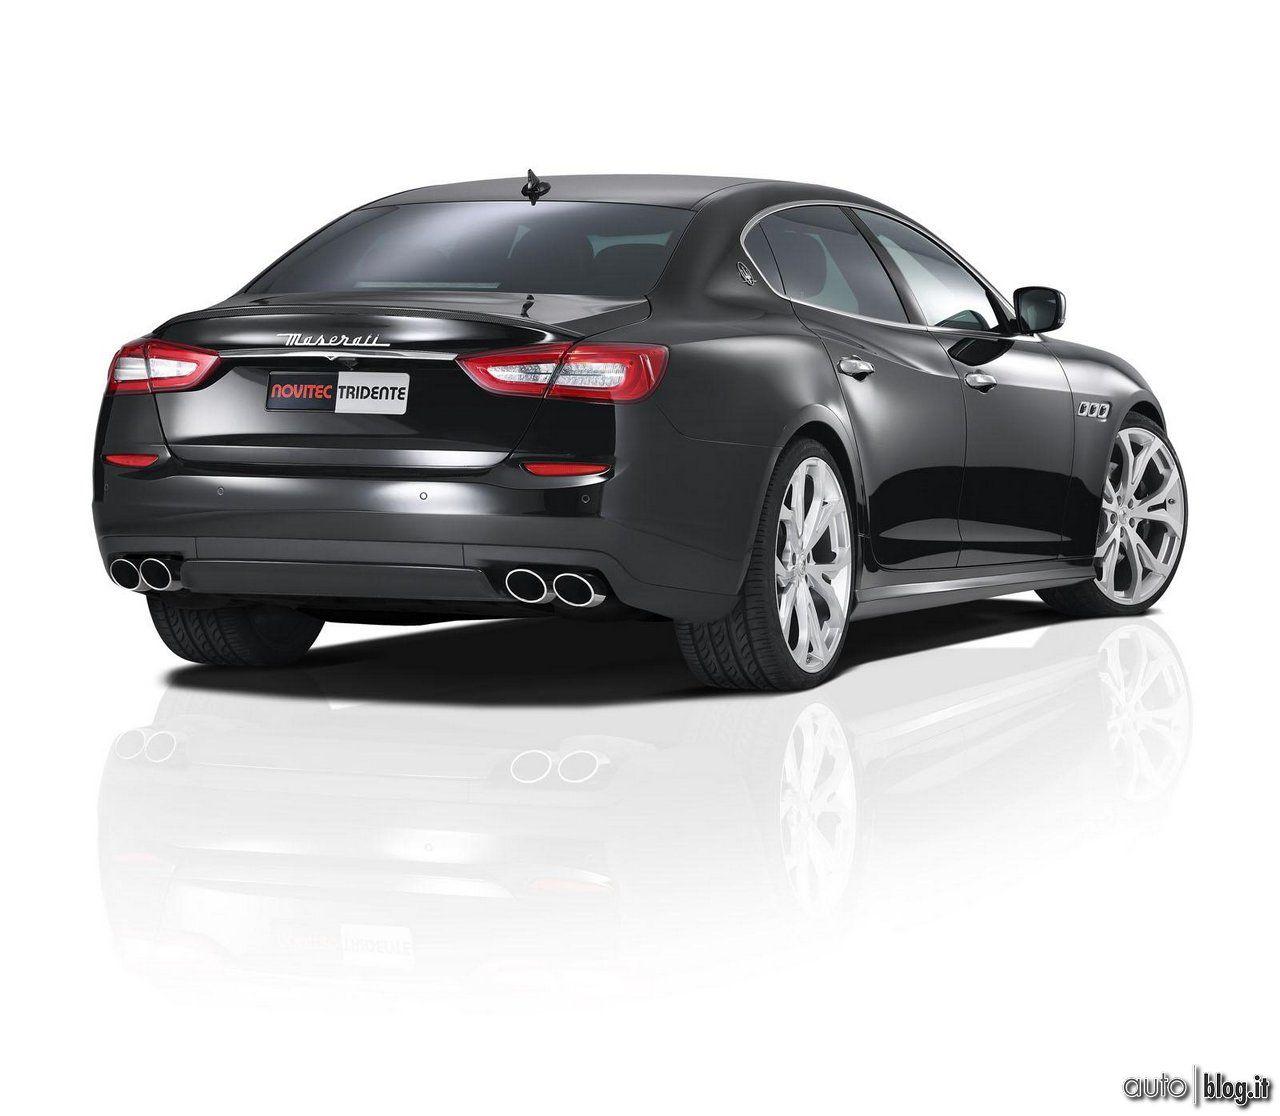 Maserati Quattroporte Novitec Tridente